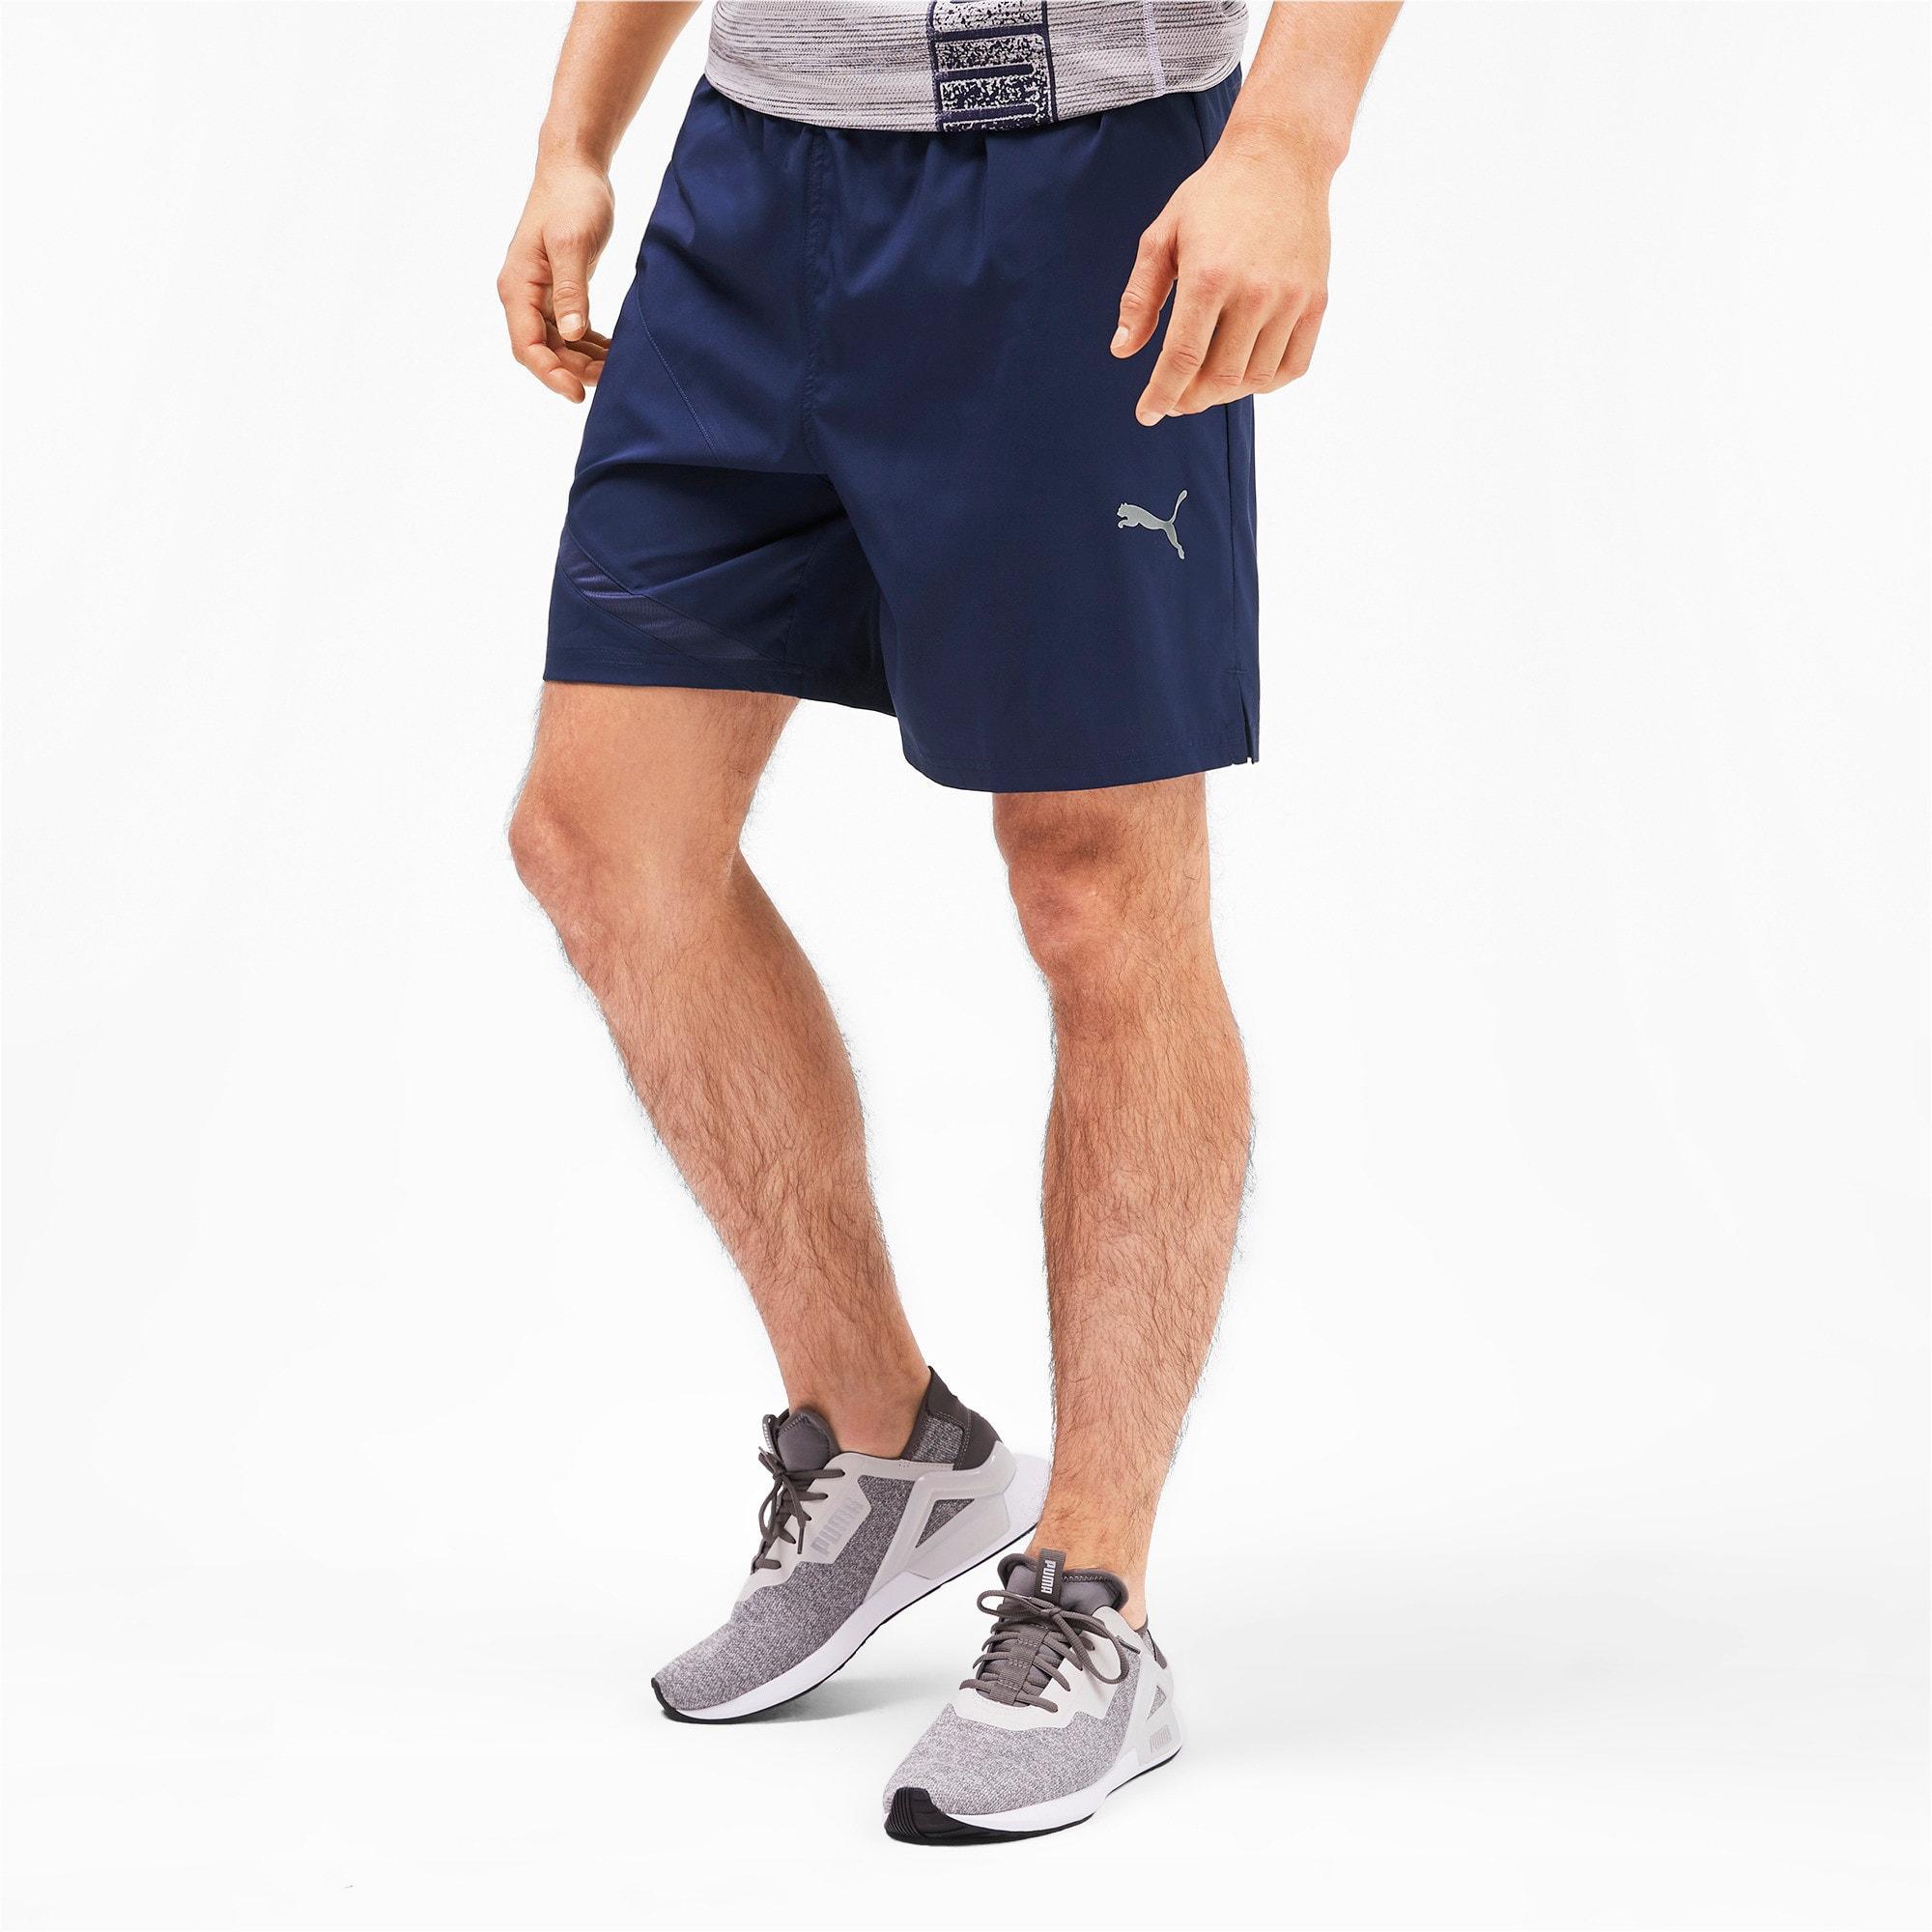 Thumbnail 1 of IGNITE Woven Men's Training Shorts, Peacoat, medium-IND